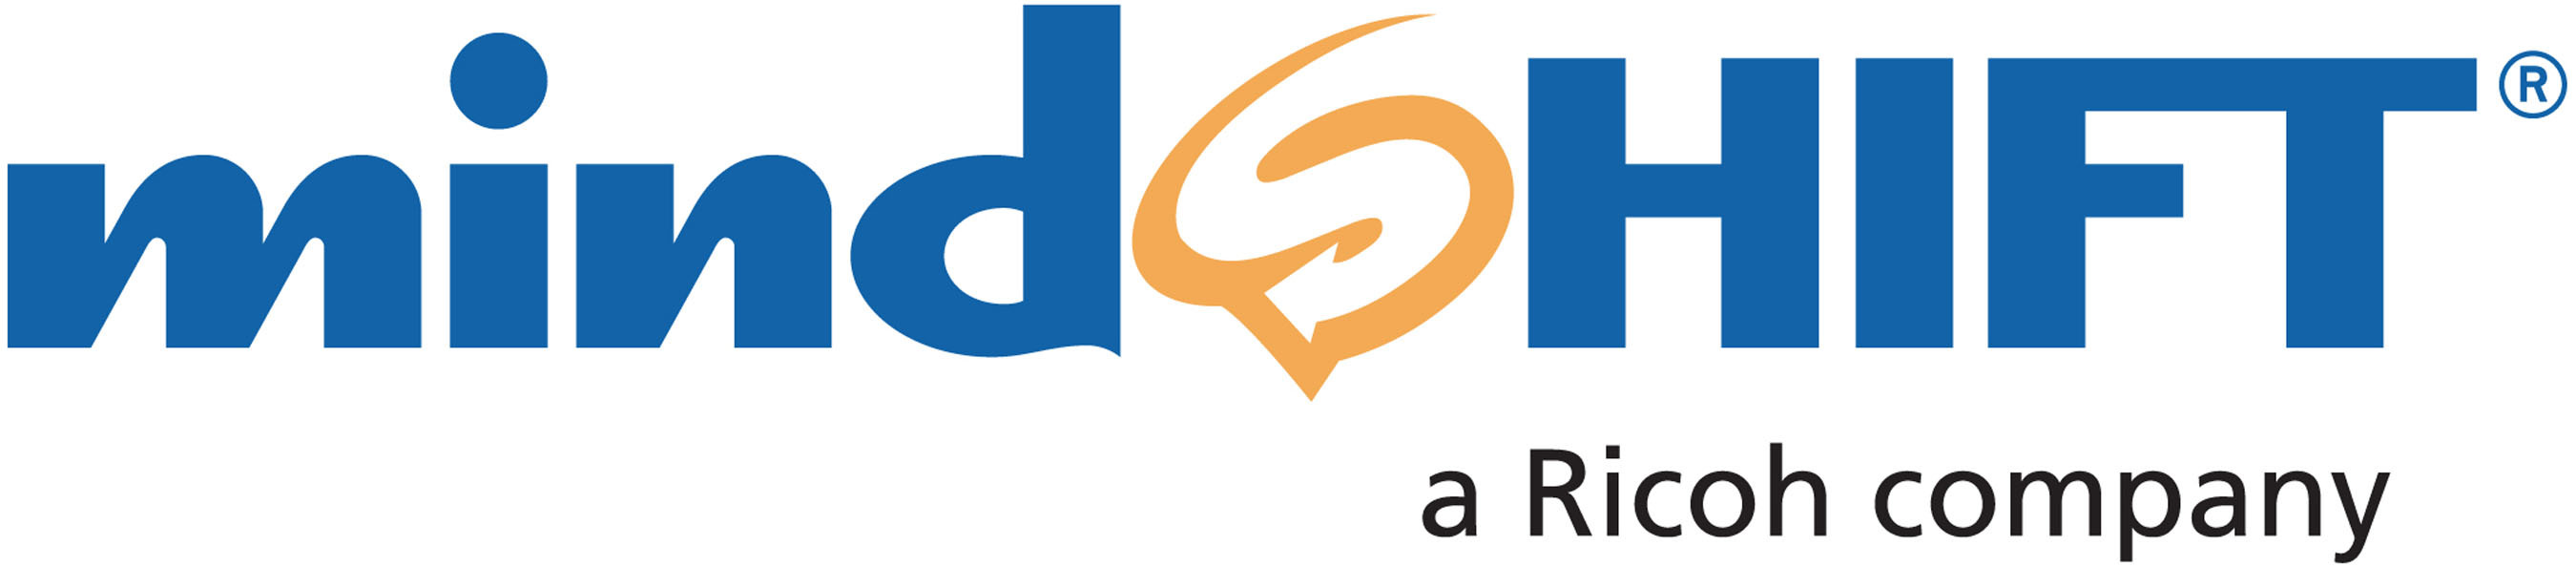 mindSHIFT, a Ricoh Company. (PRNewsFoto/mindSHIFT, a Ricoh Company)